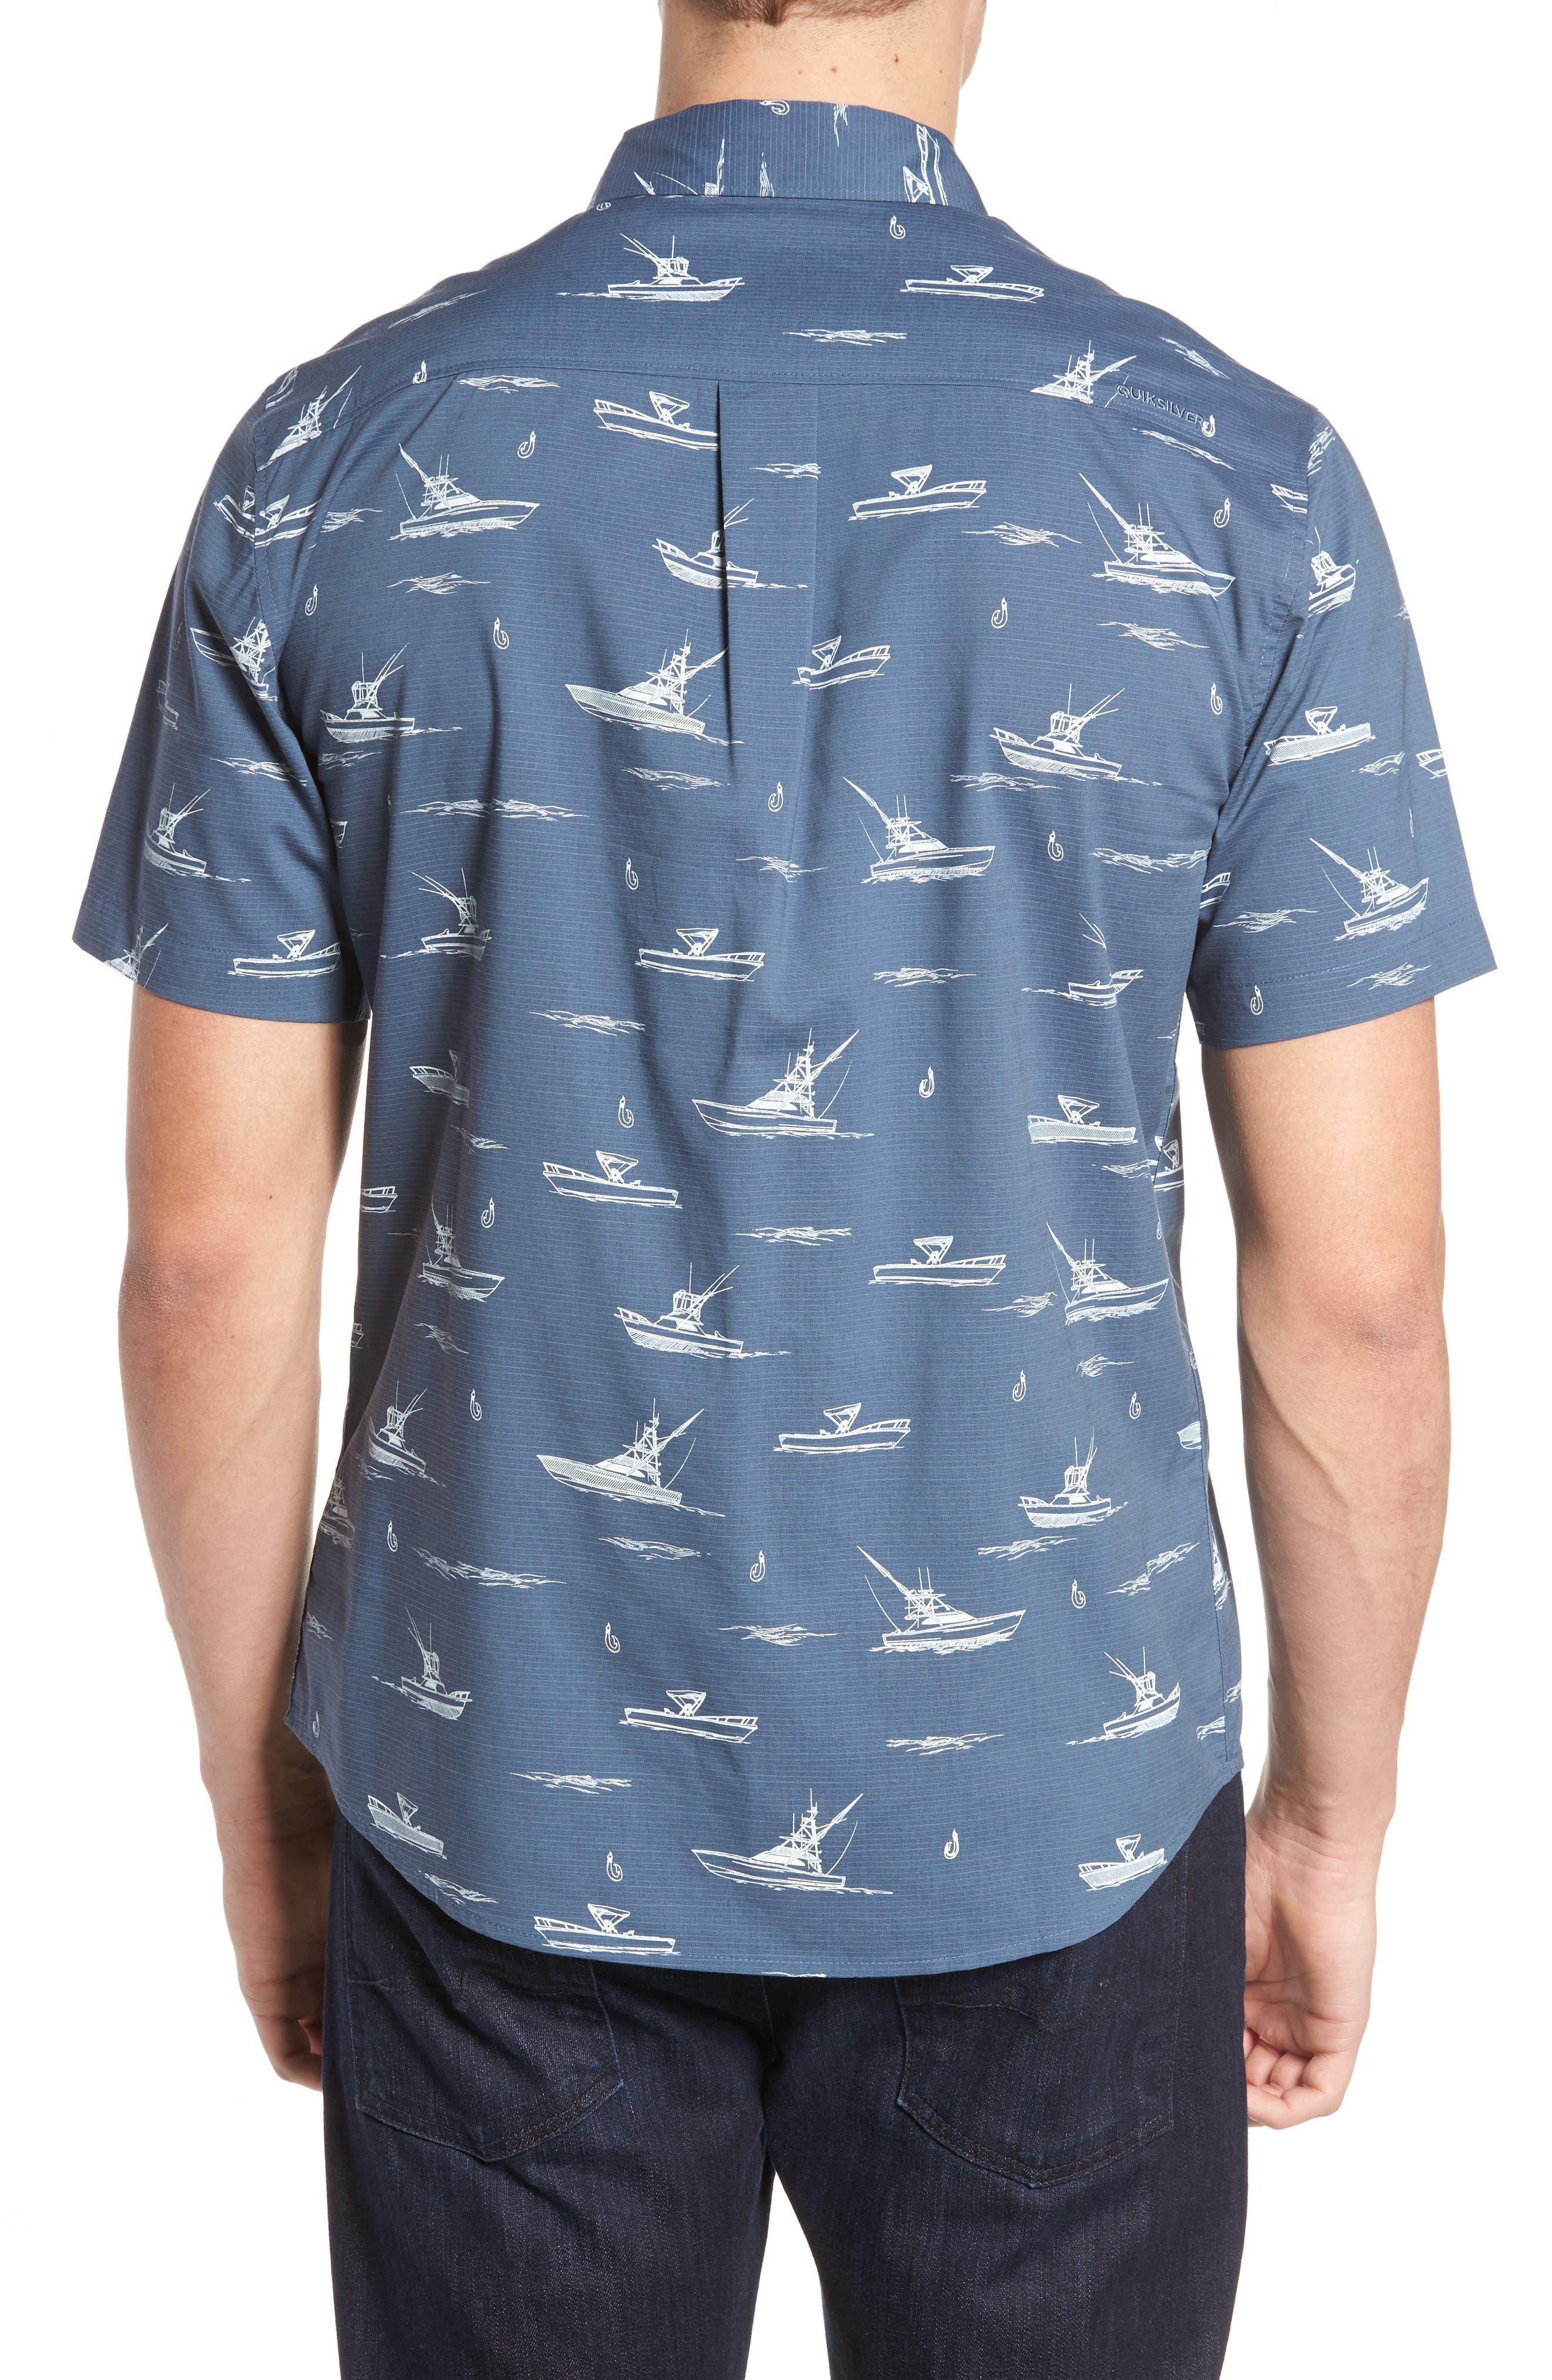 Fishboats Sport Shirt,                             Alternate thumbnail 3, color,